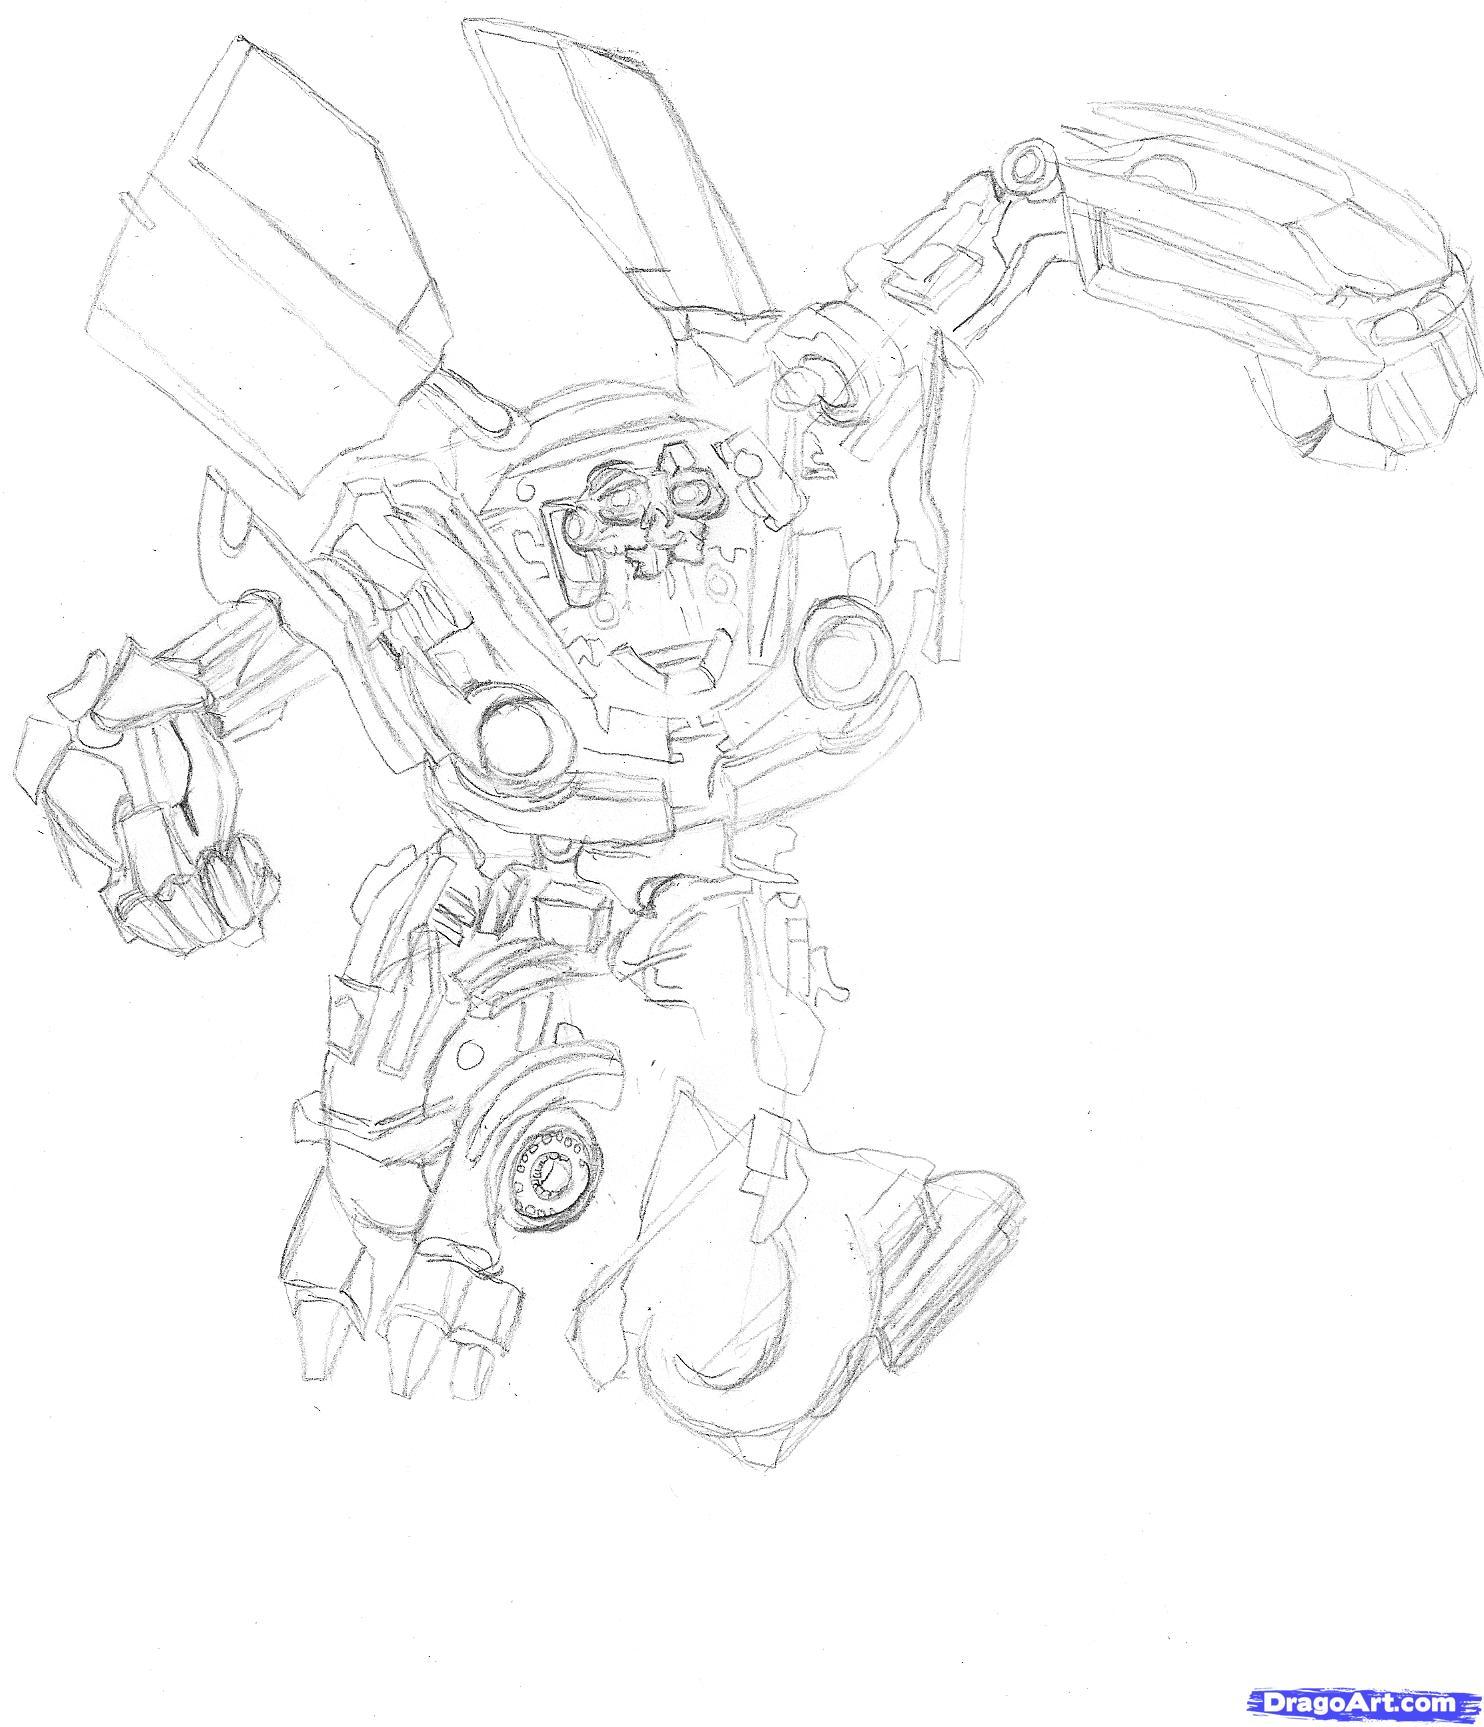 Drawn transformers Drawing Transformers Characters Mudflap transformers Draw step draw